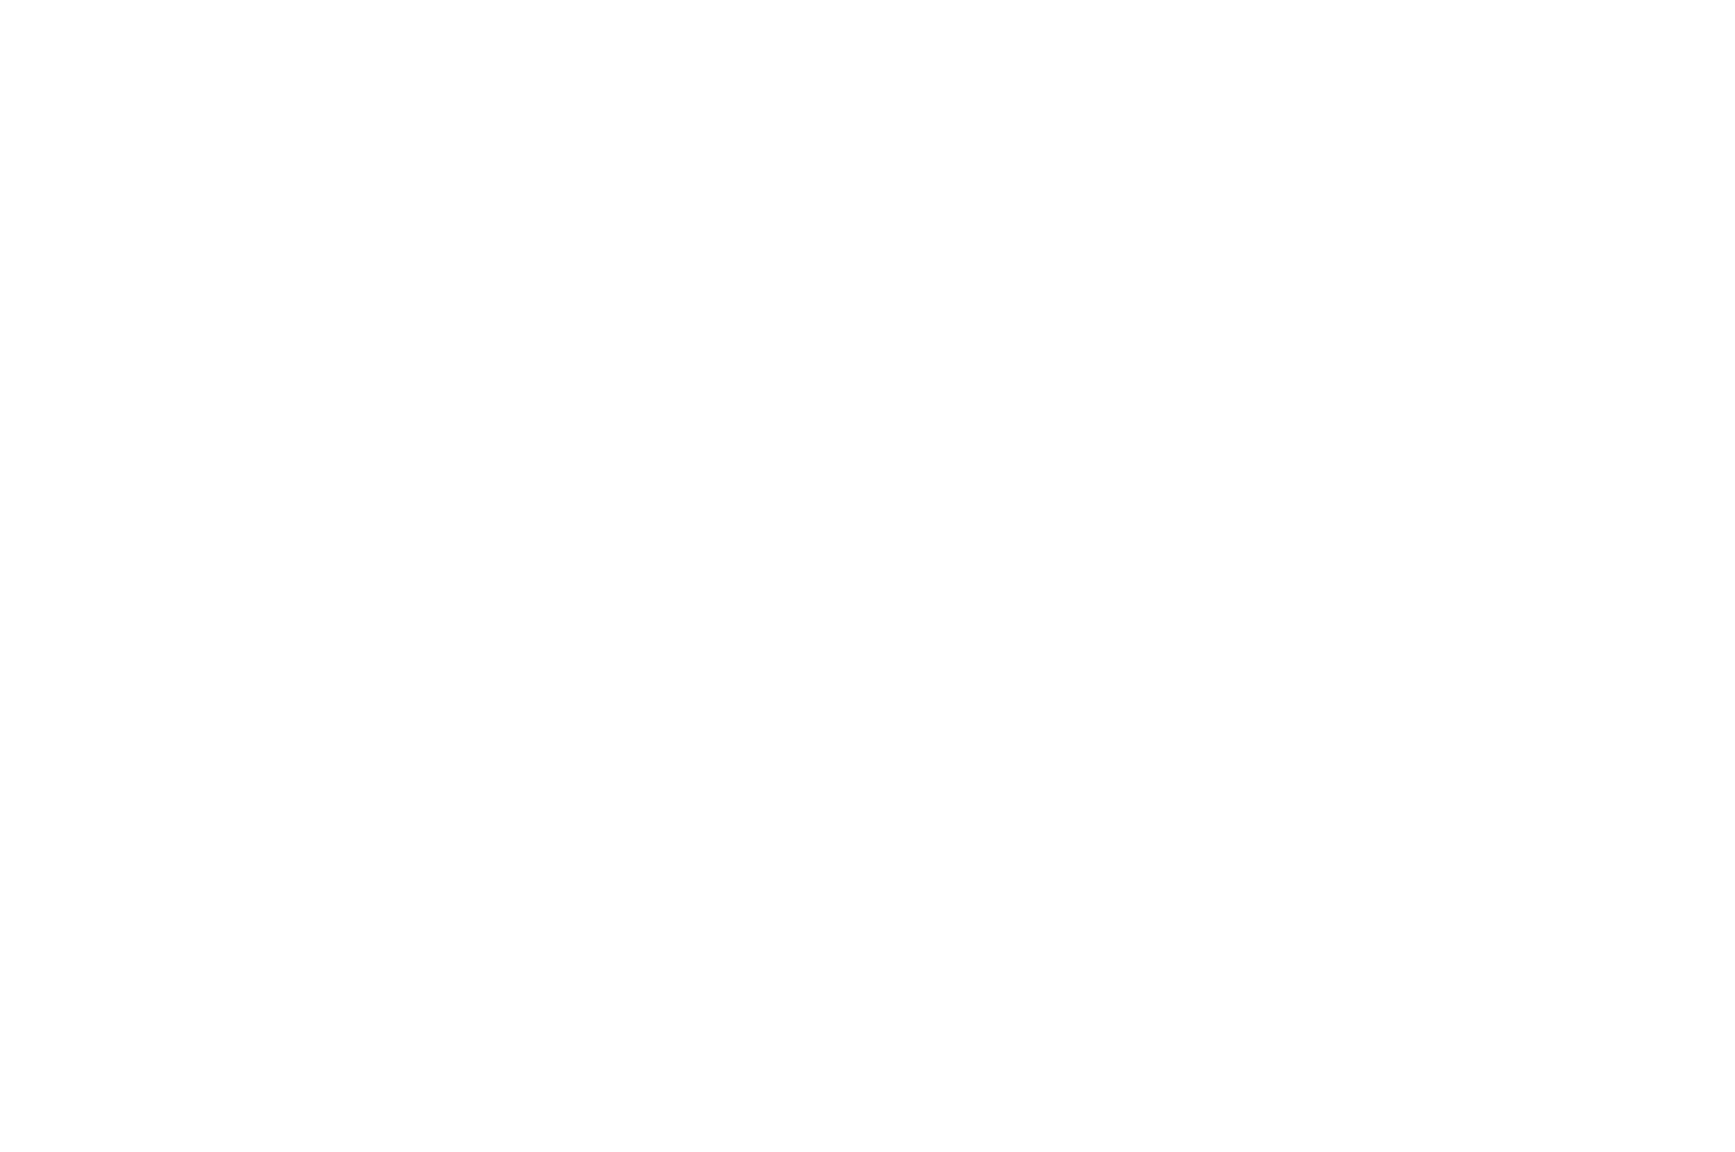 OFFICIAL SELECTION - Catalyst Film Festi